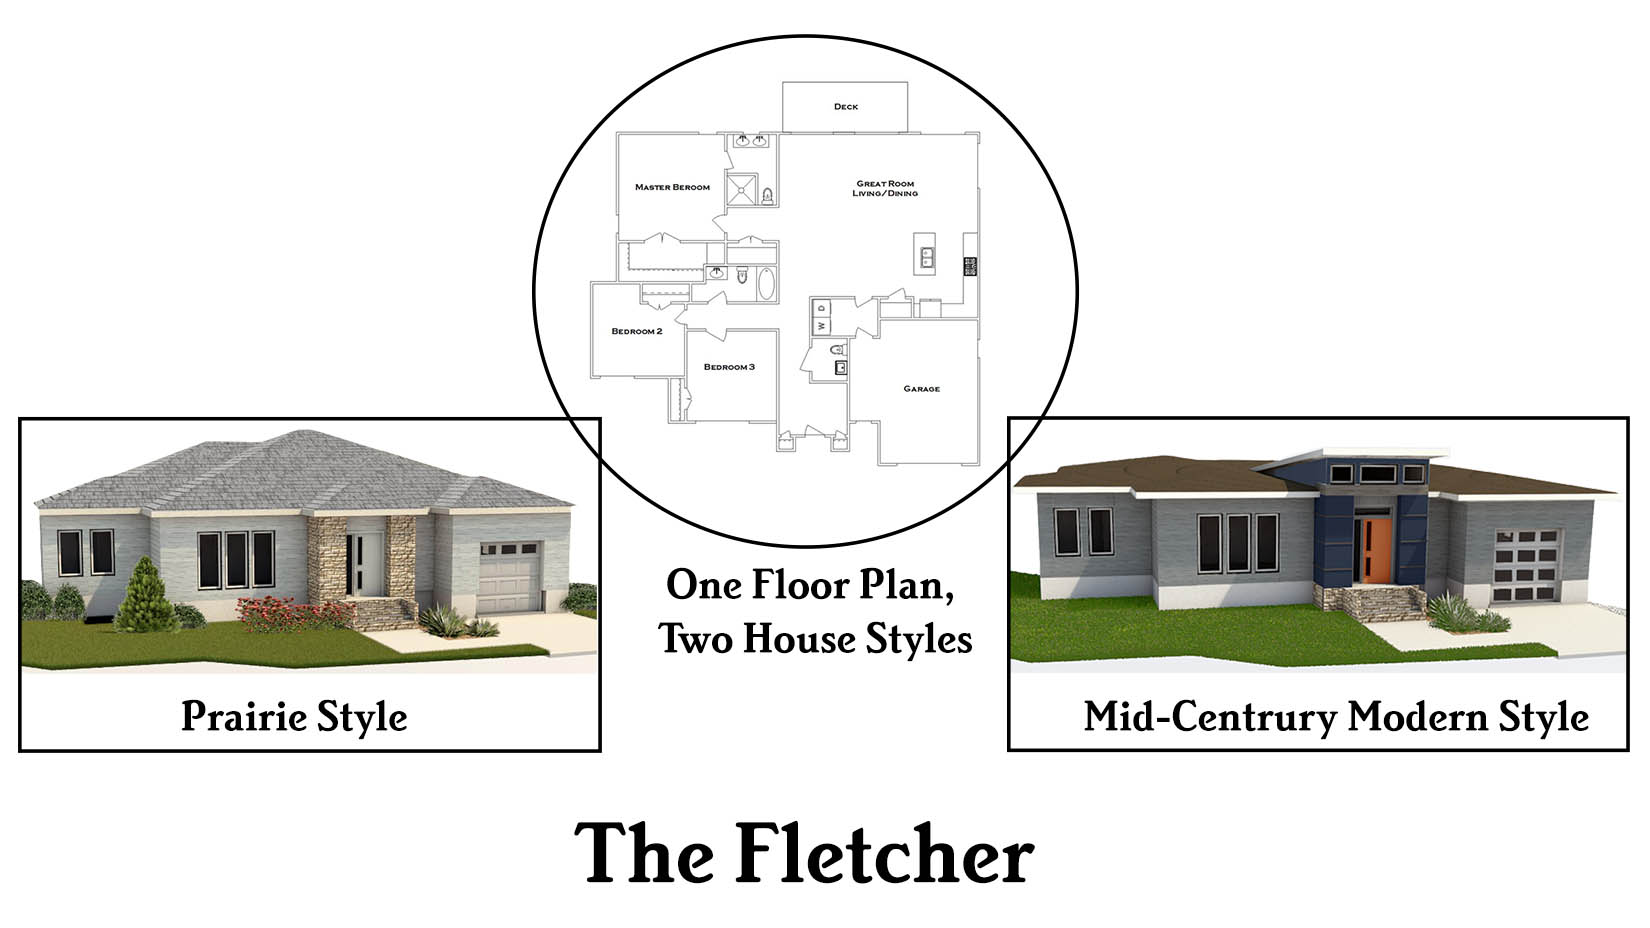 two house styles - Fletcher smaller.jpg